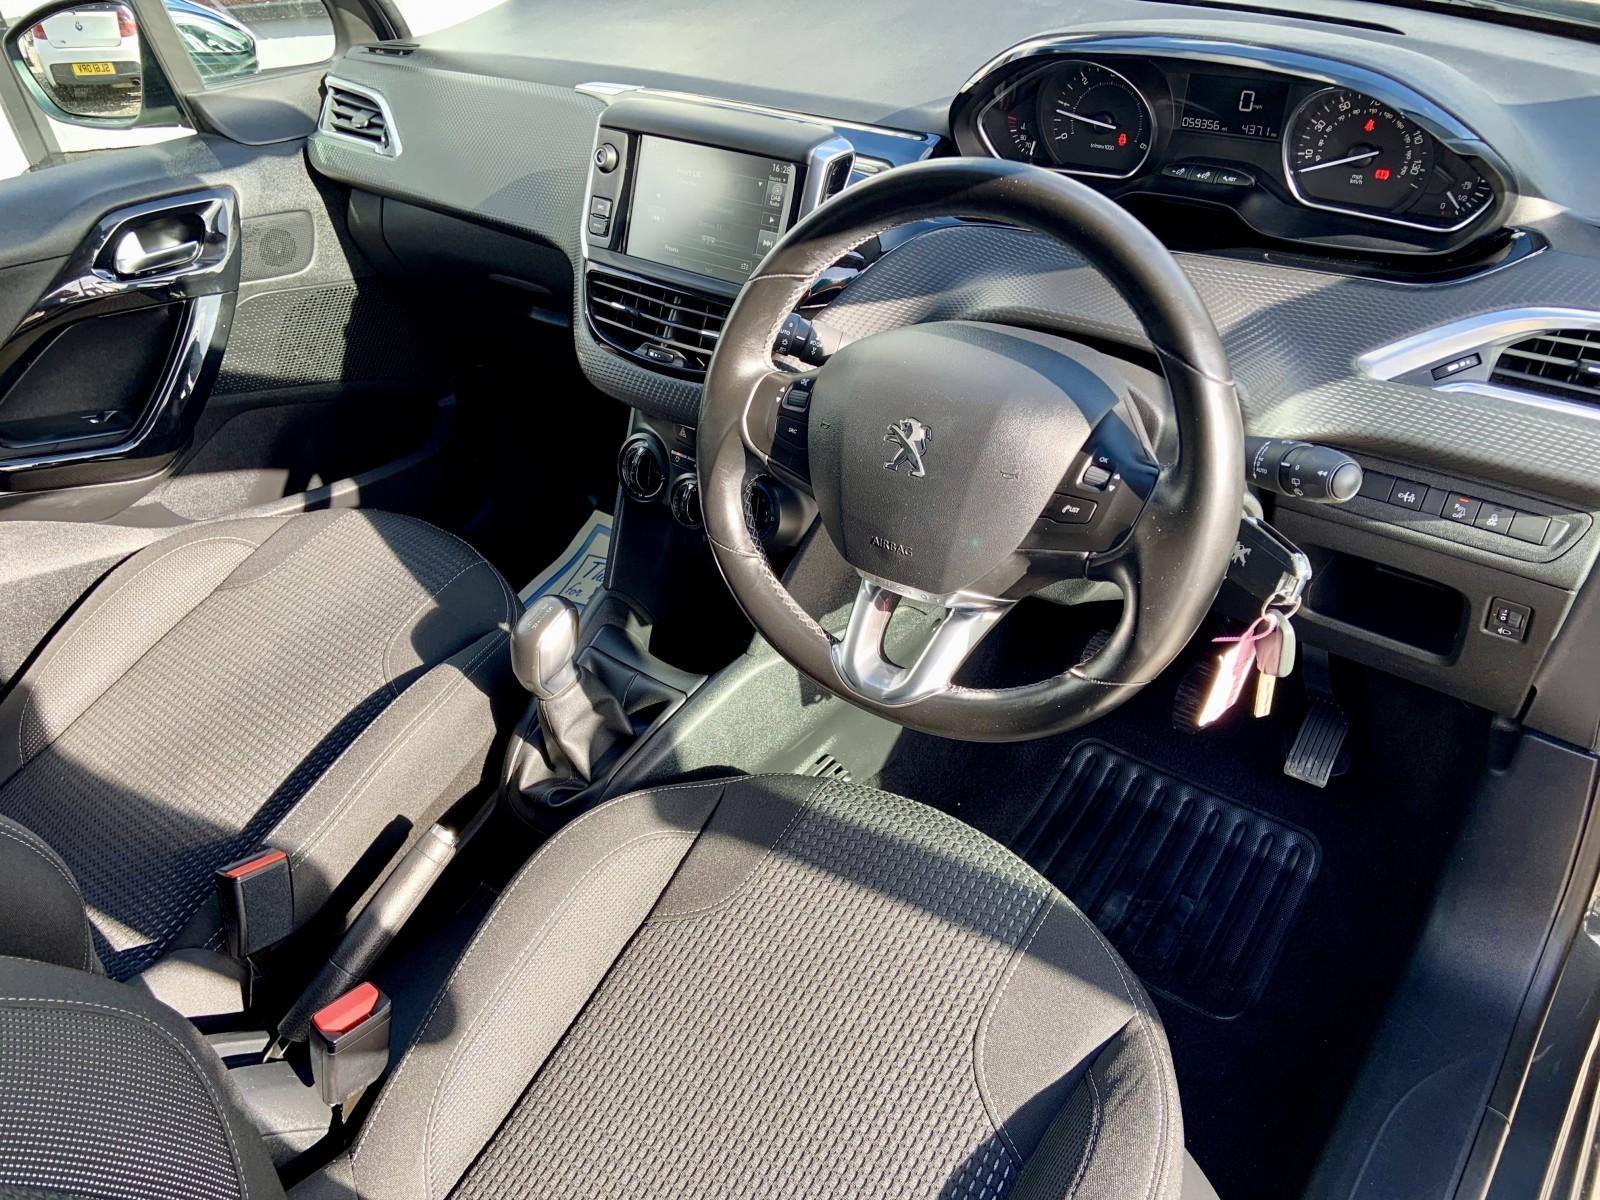 2015 Peugeot 208 BLUE HDI ALLURE Diesel Manual – BC Autosales 17A Airfield Road, Eglinton, Londonderry BT47 3PZ, UK full